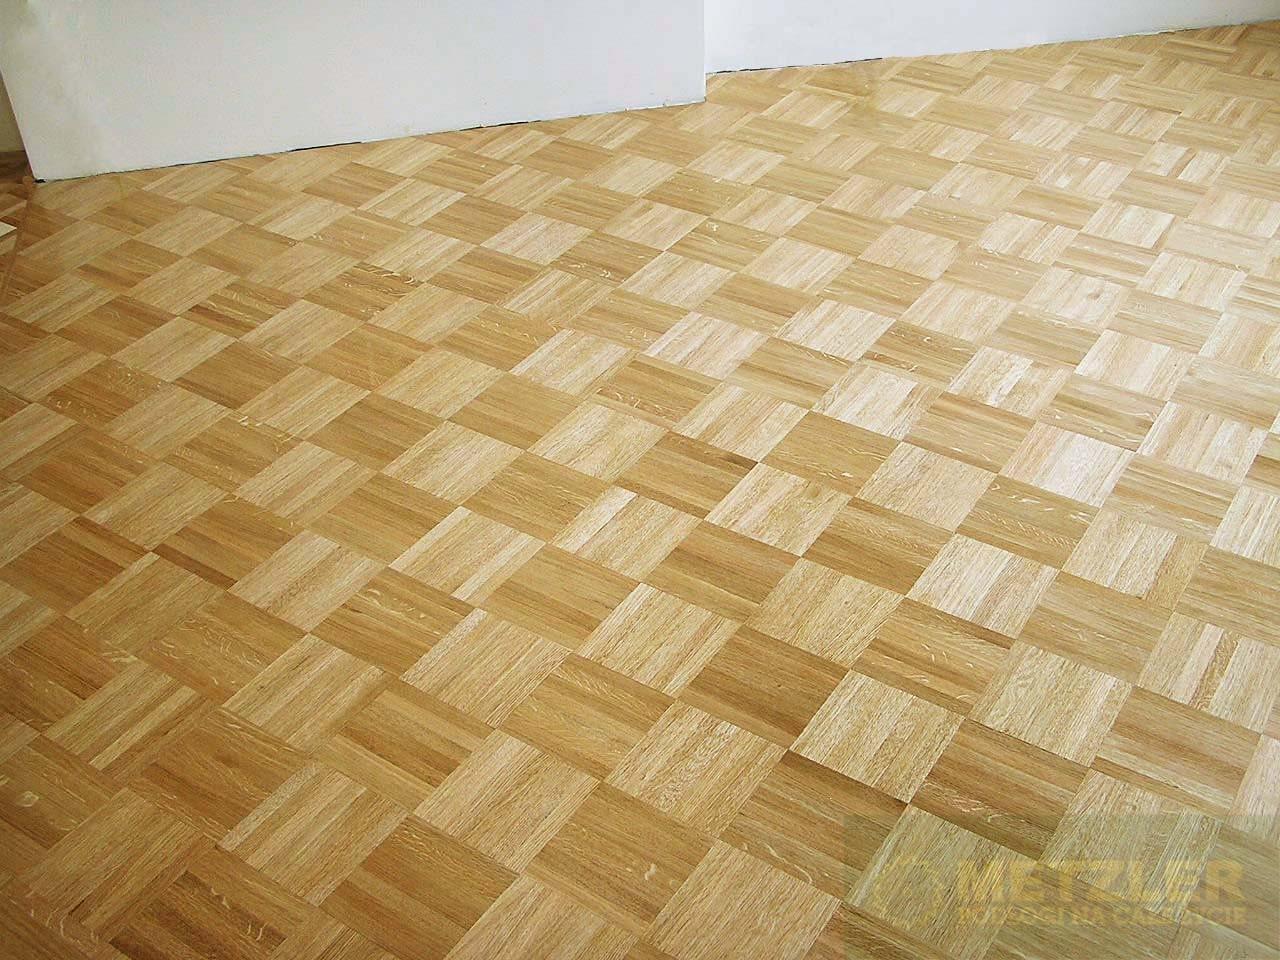 10 Mm Wood Laminate Flooring